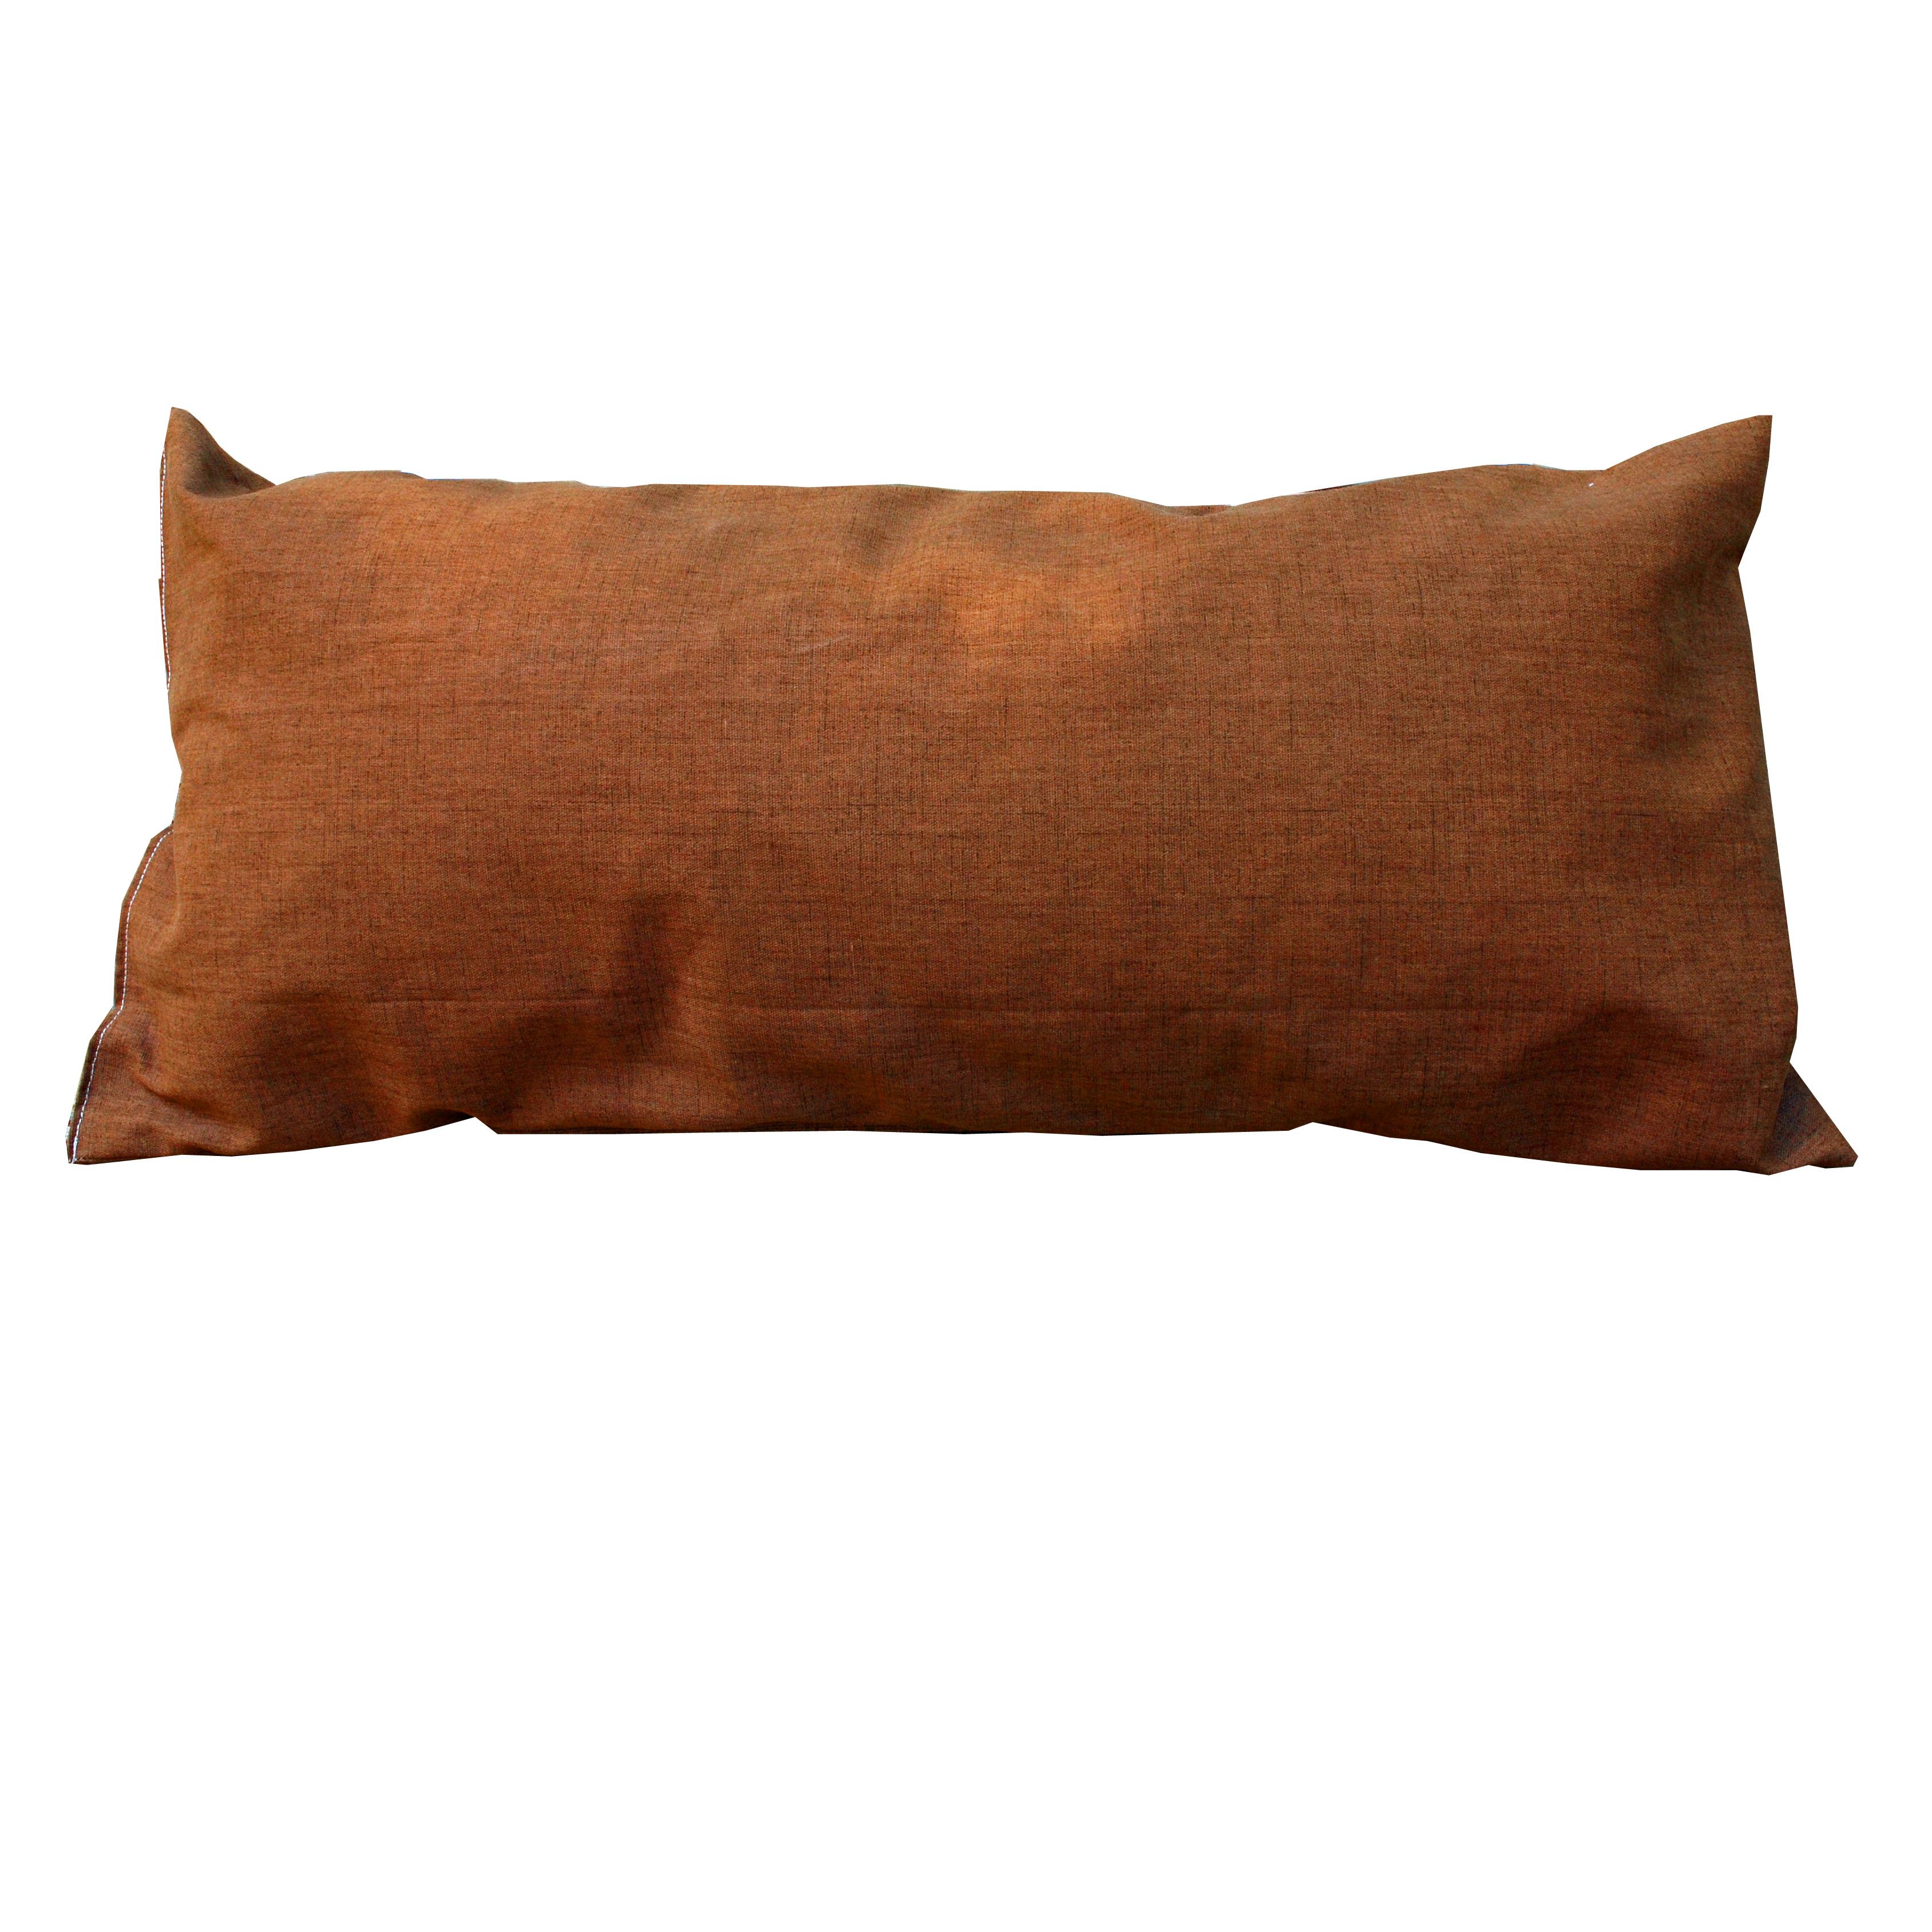 Deluxe Hammock Pillow - Marlin Linen Tan (Brown)